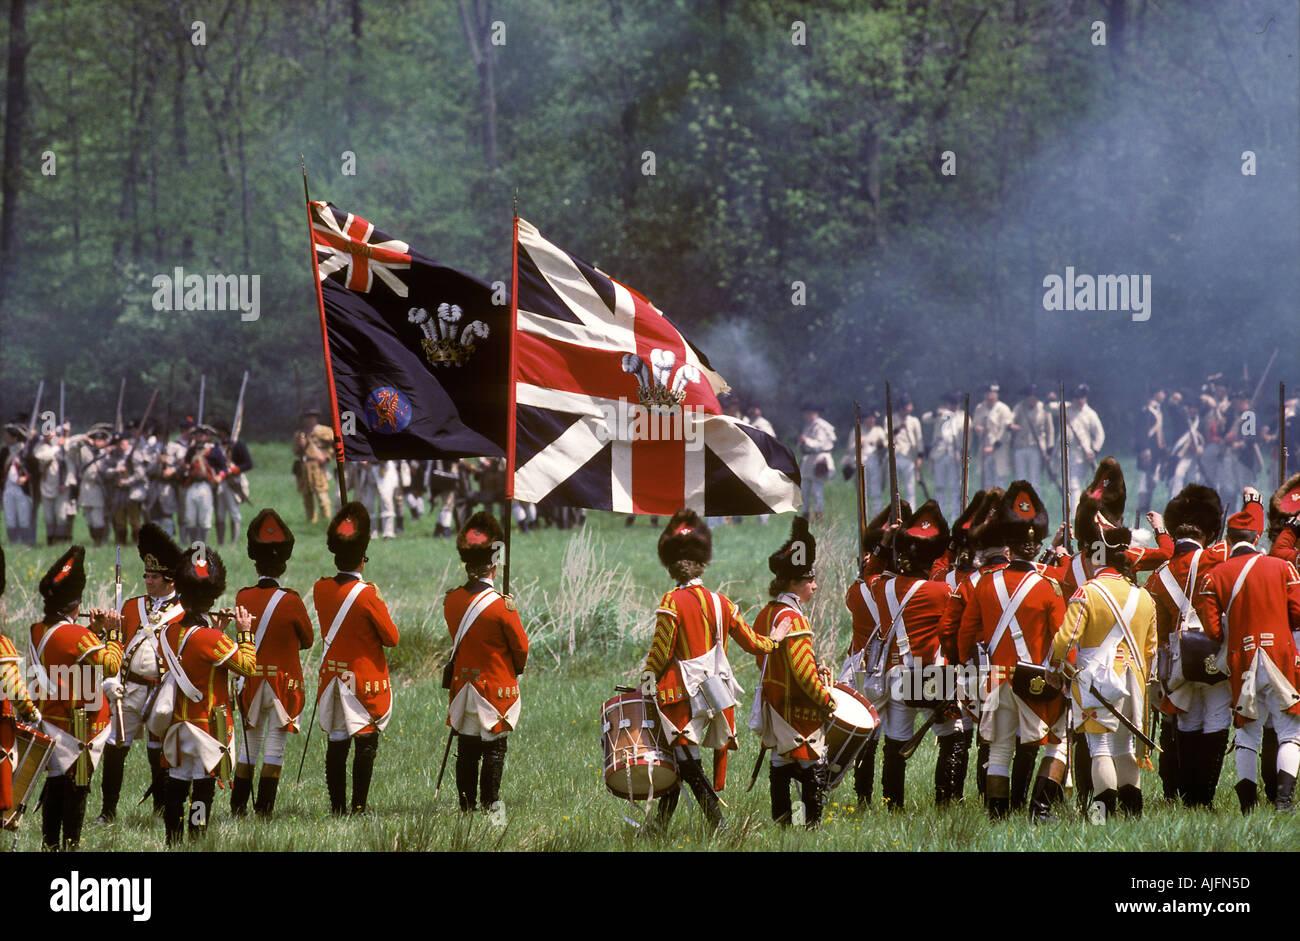 Revolutionary War Reenactment Historical Morristown New Jersey - Stock Image